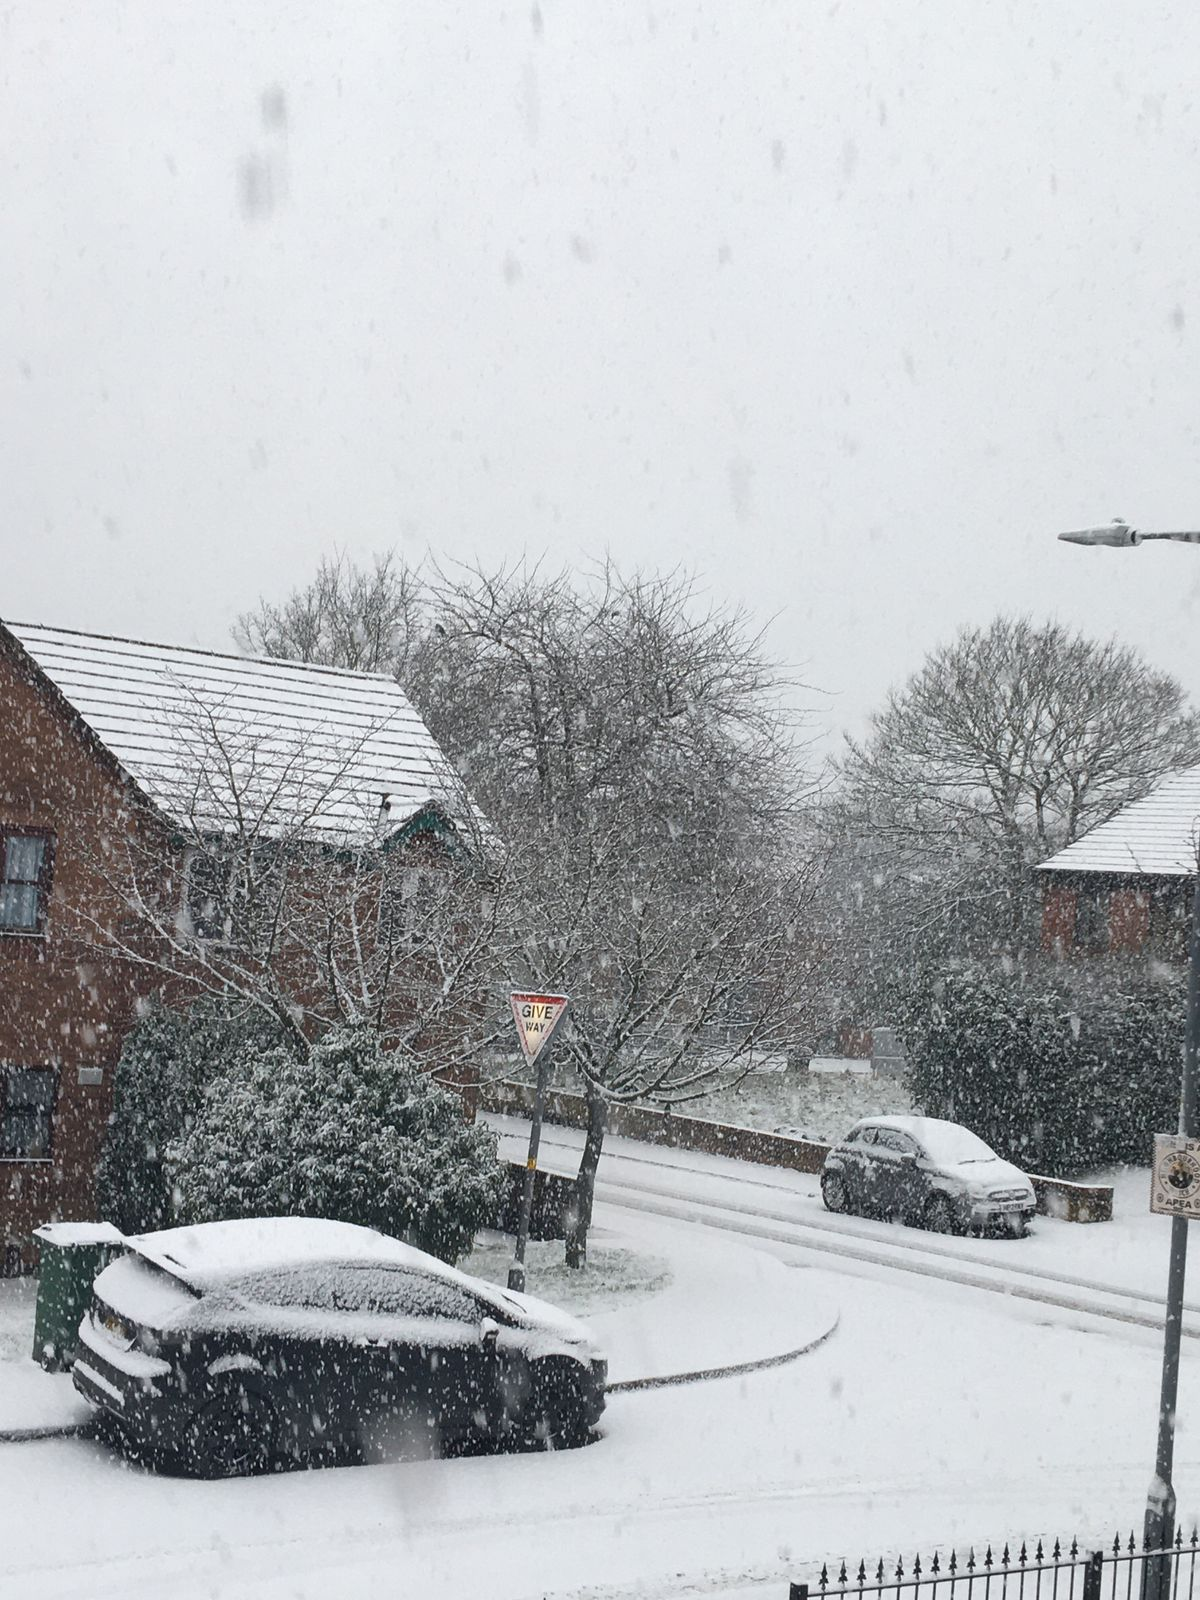 Snow in Tipton. Photo: Jessica Grew